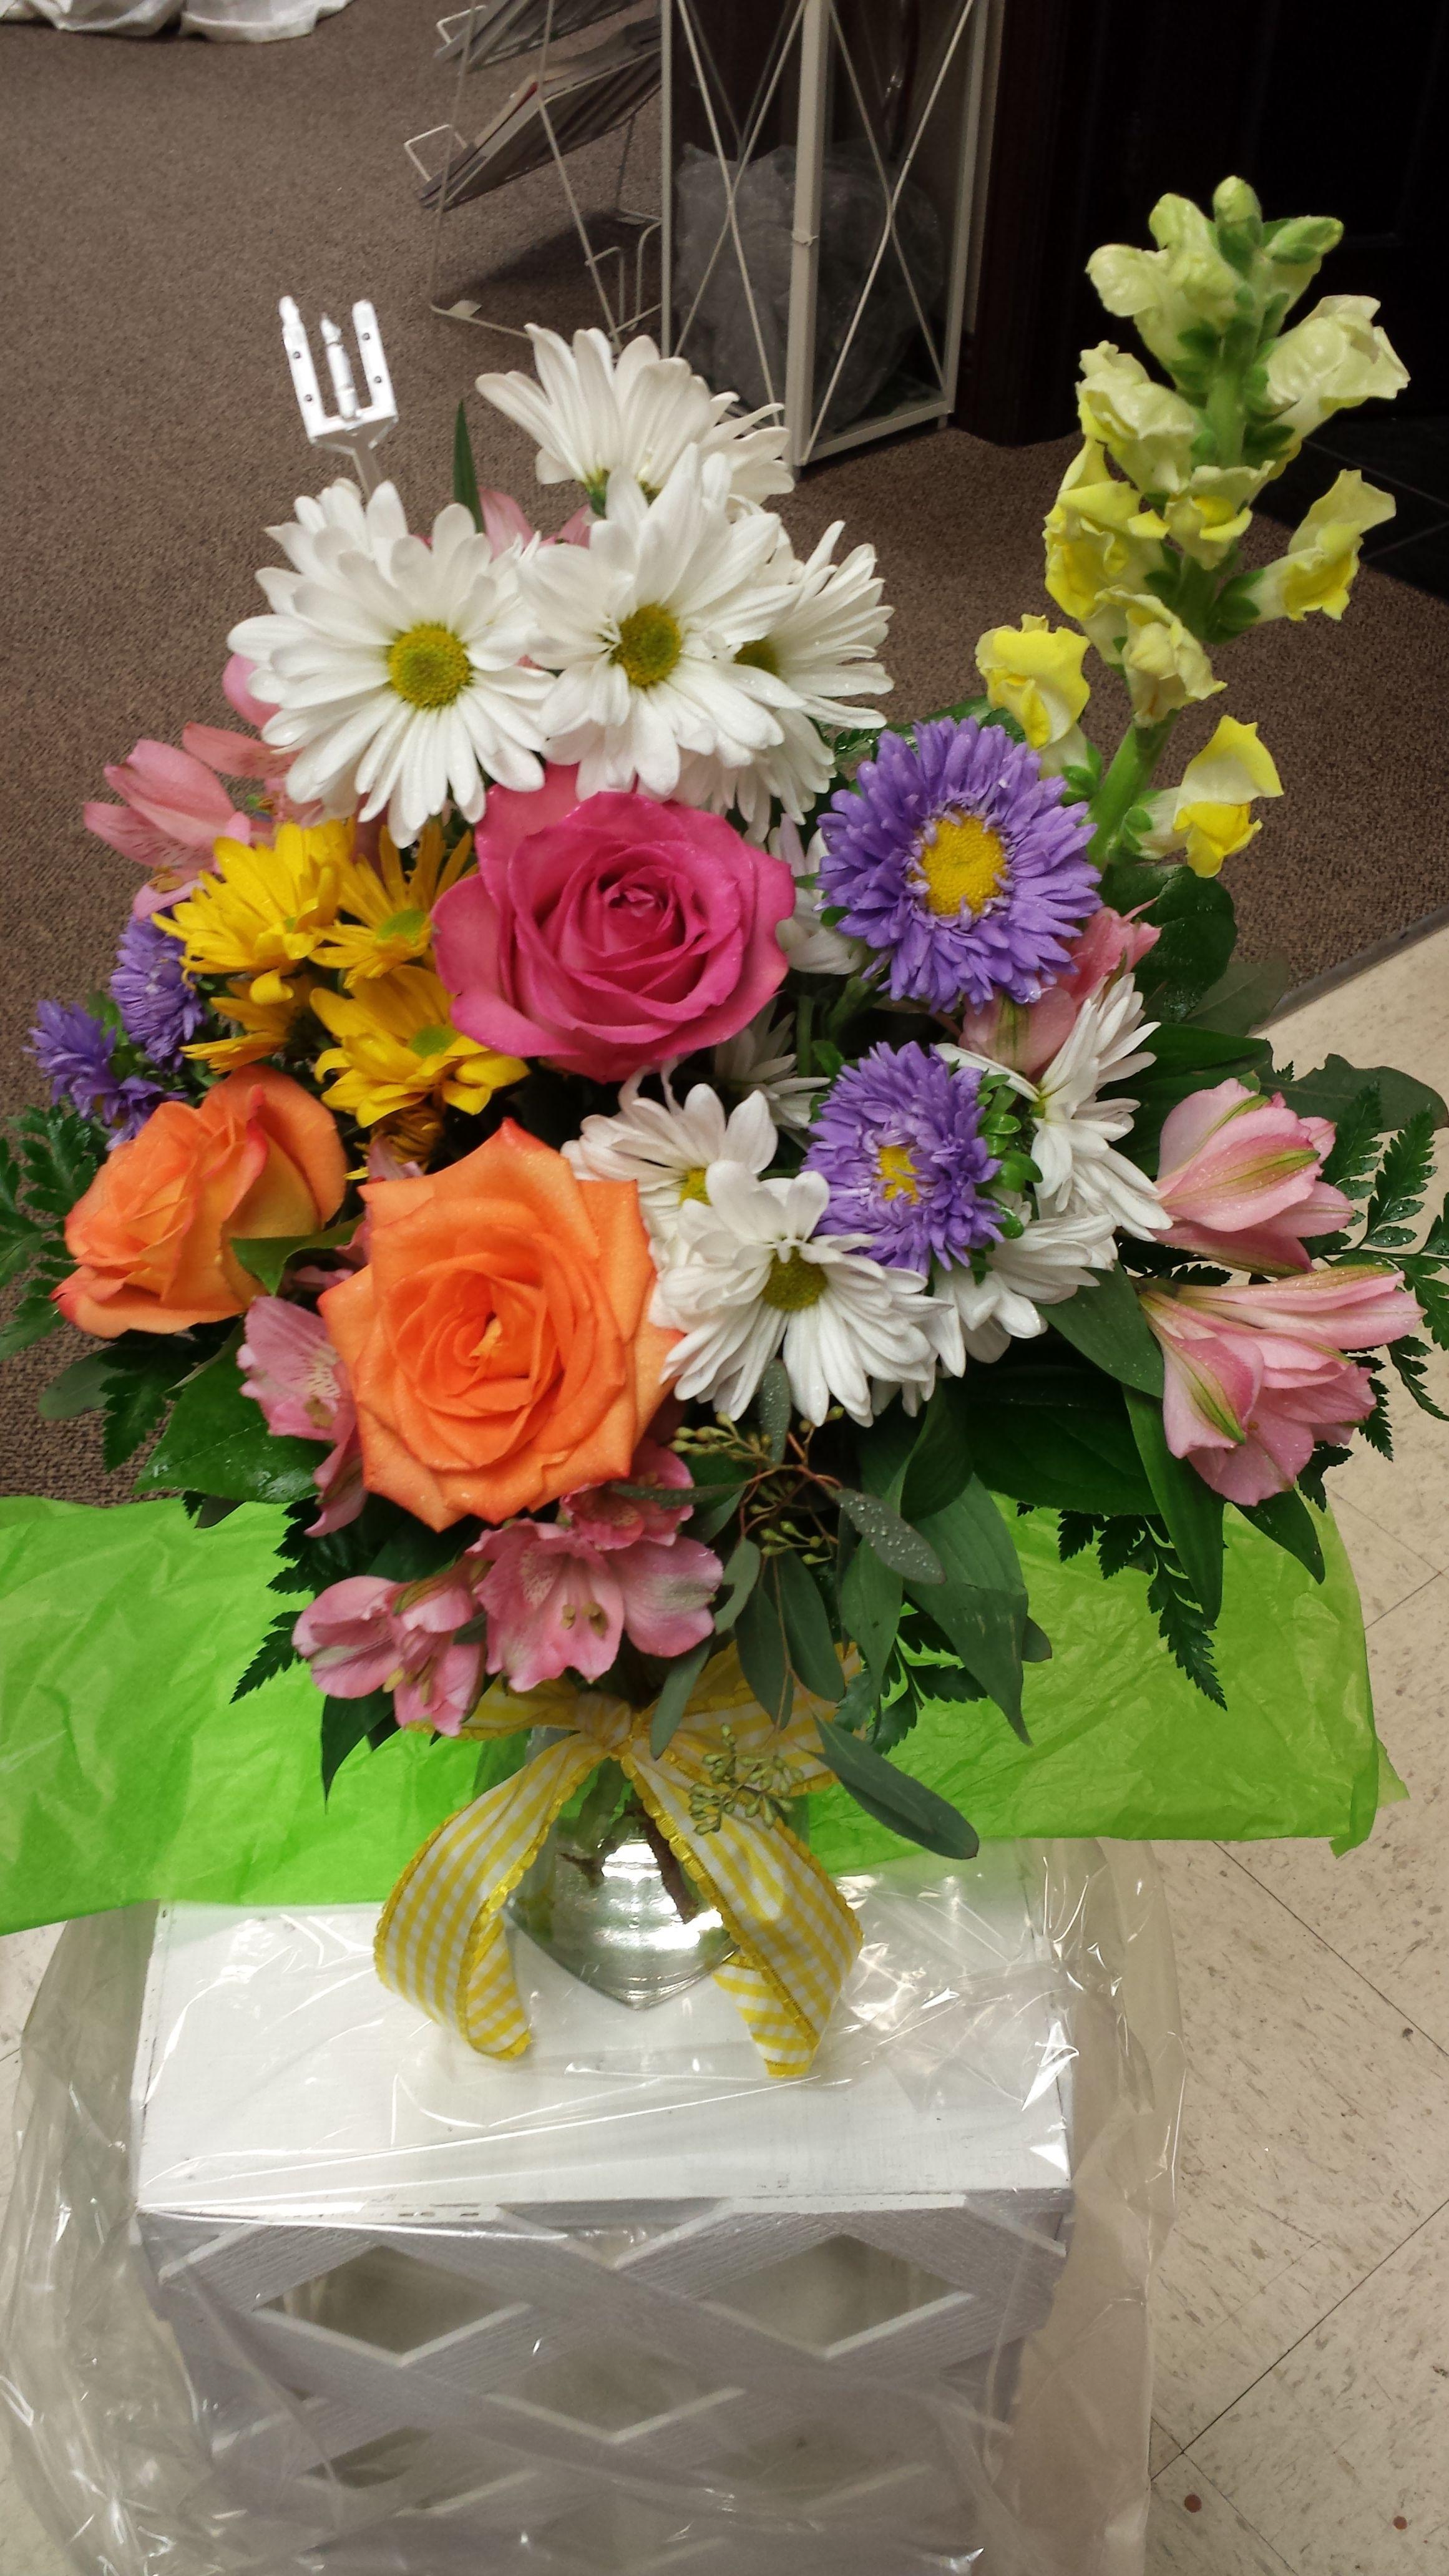 Roses, Alstromeria, Matsumoto Asters, Snap Dragon and Daisies ...